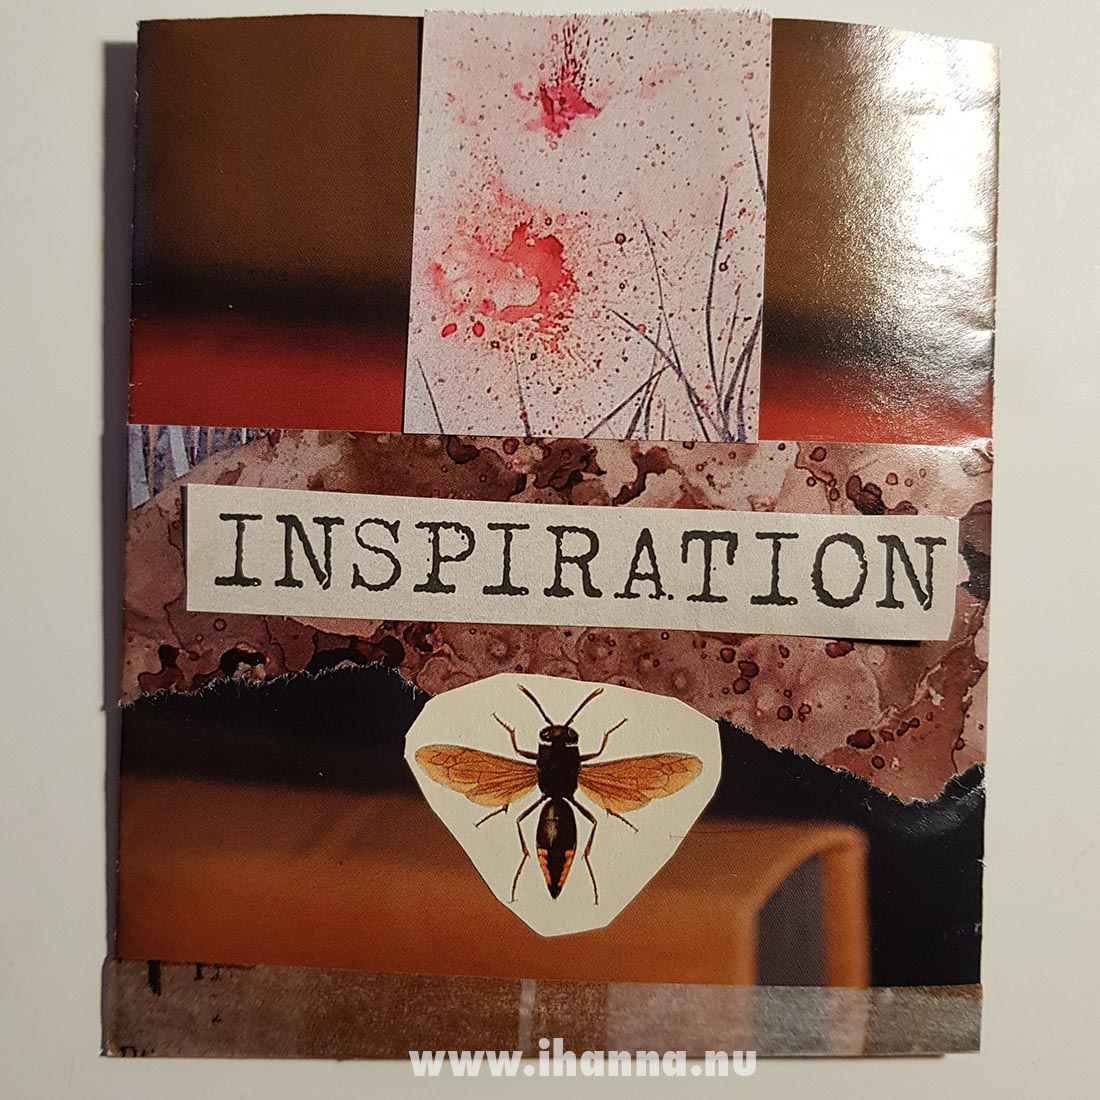 Inspiration Happy mail mini envelope from Franca Maria to iHanna